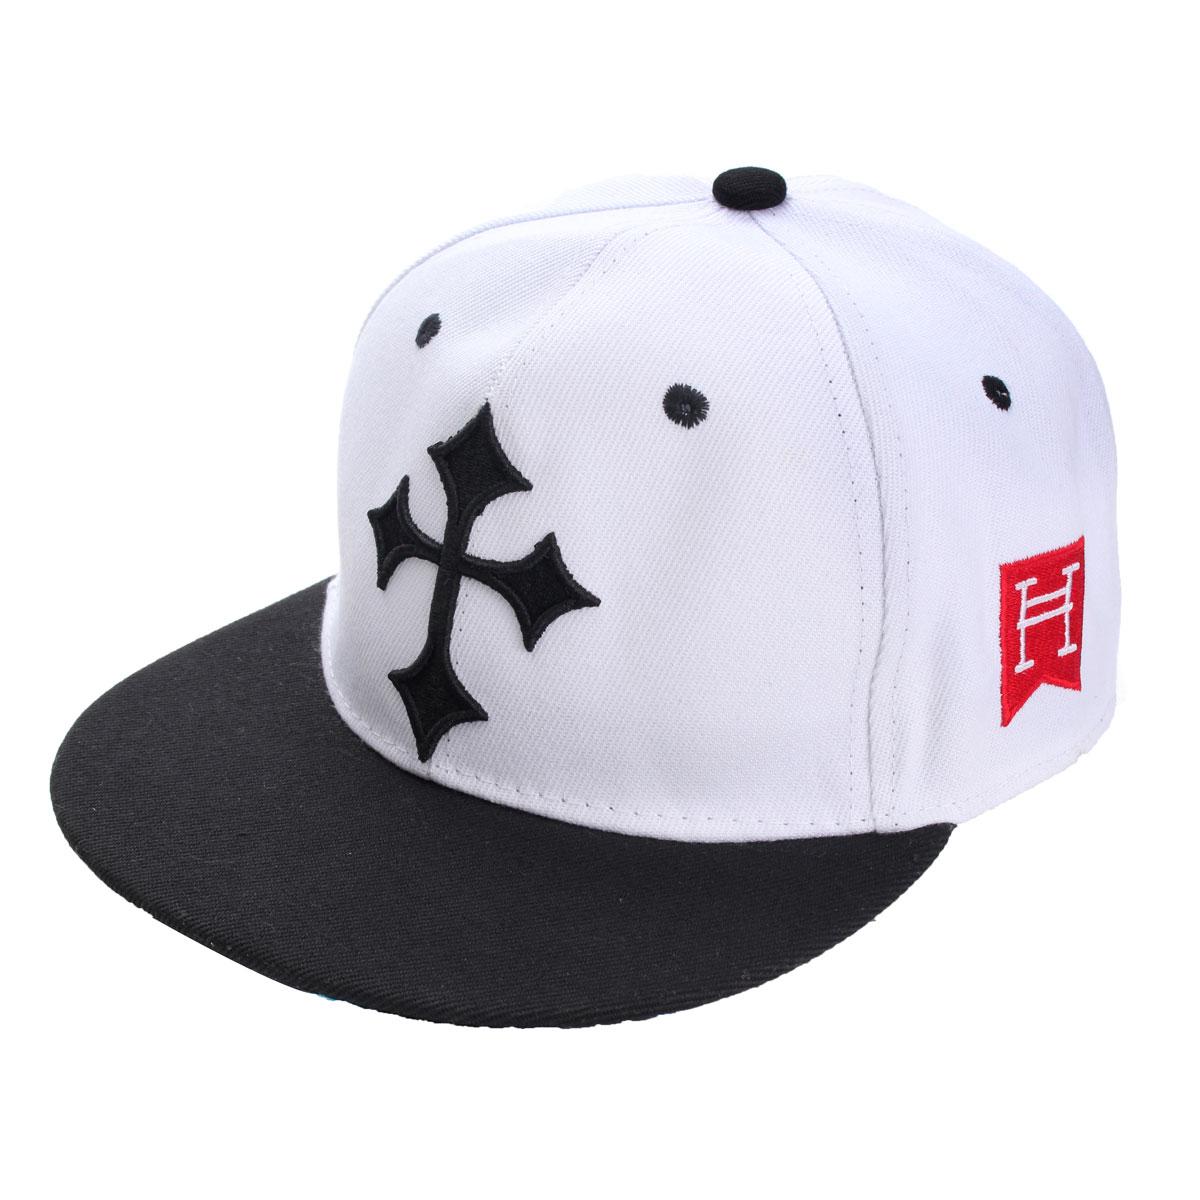 Men Women Adjustable Snapback Baseball Cap Hip Hop Bboy Cross Brim Dancing Hat